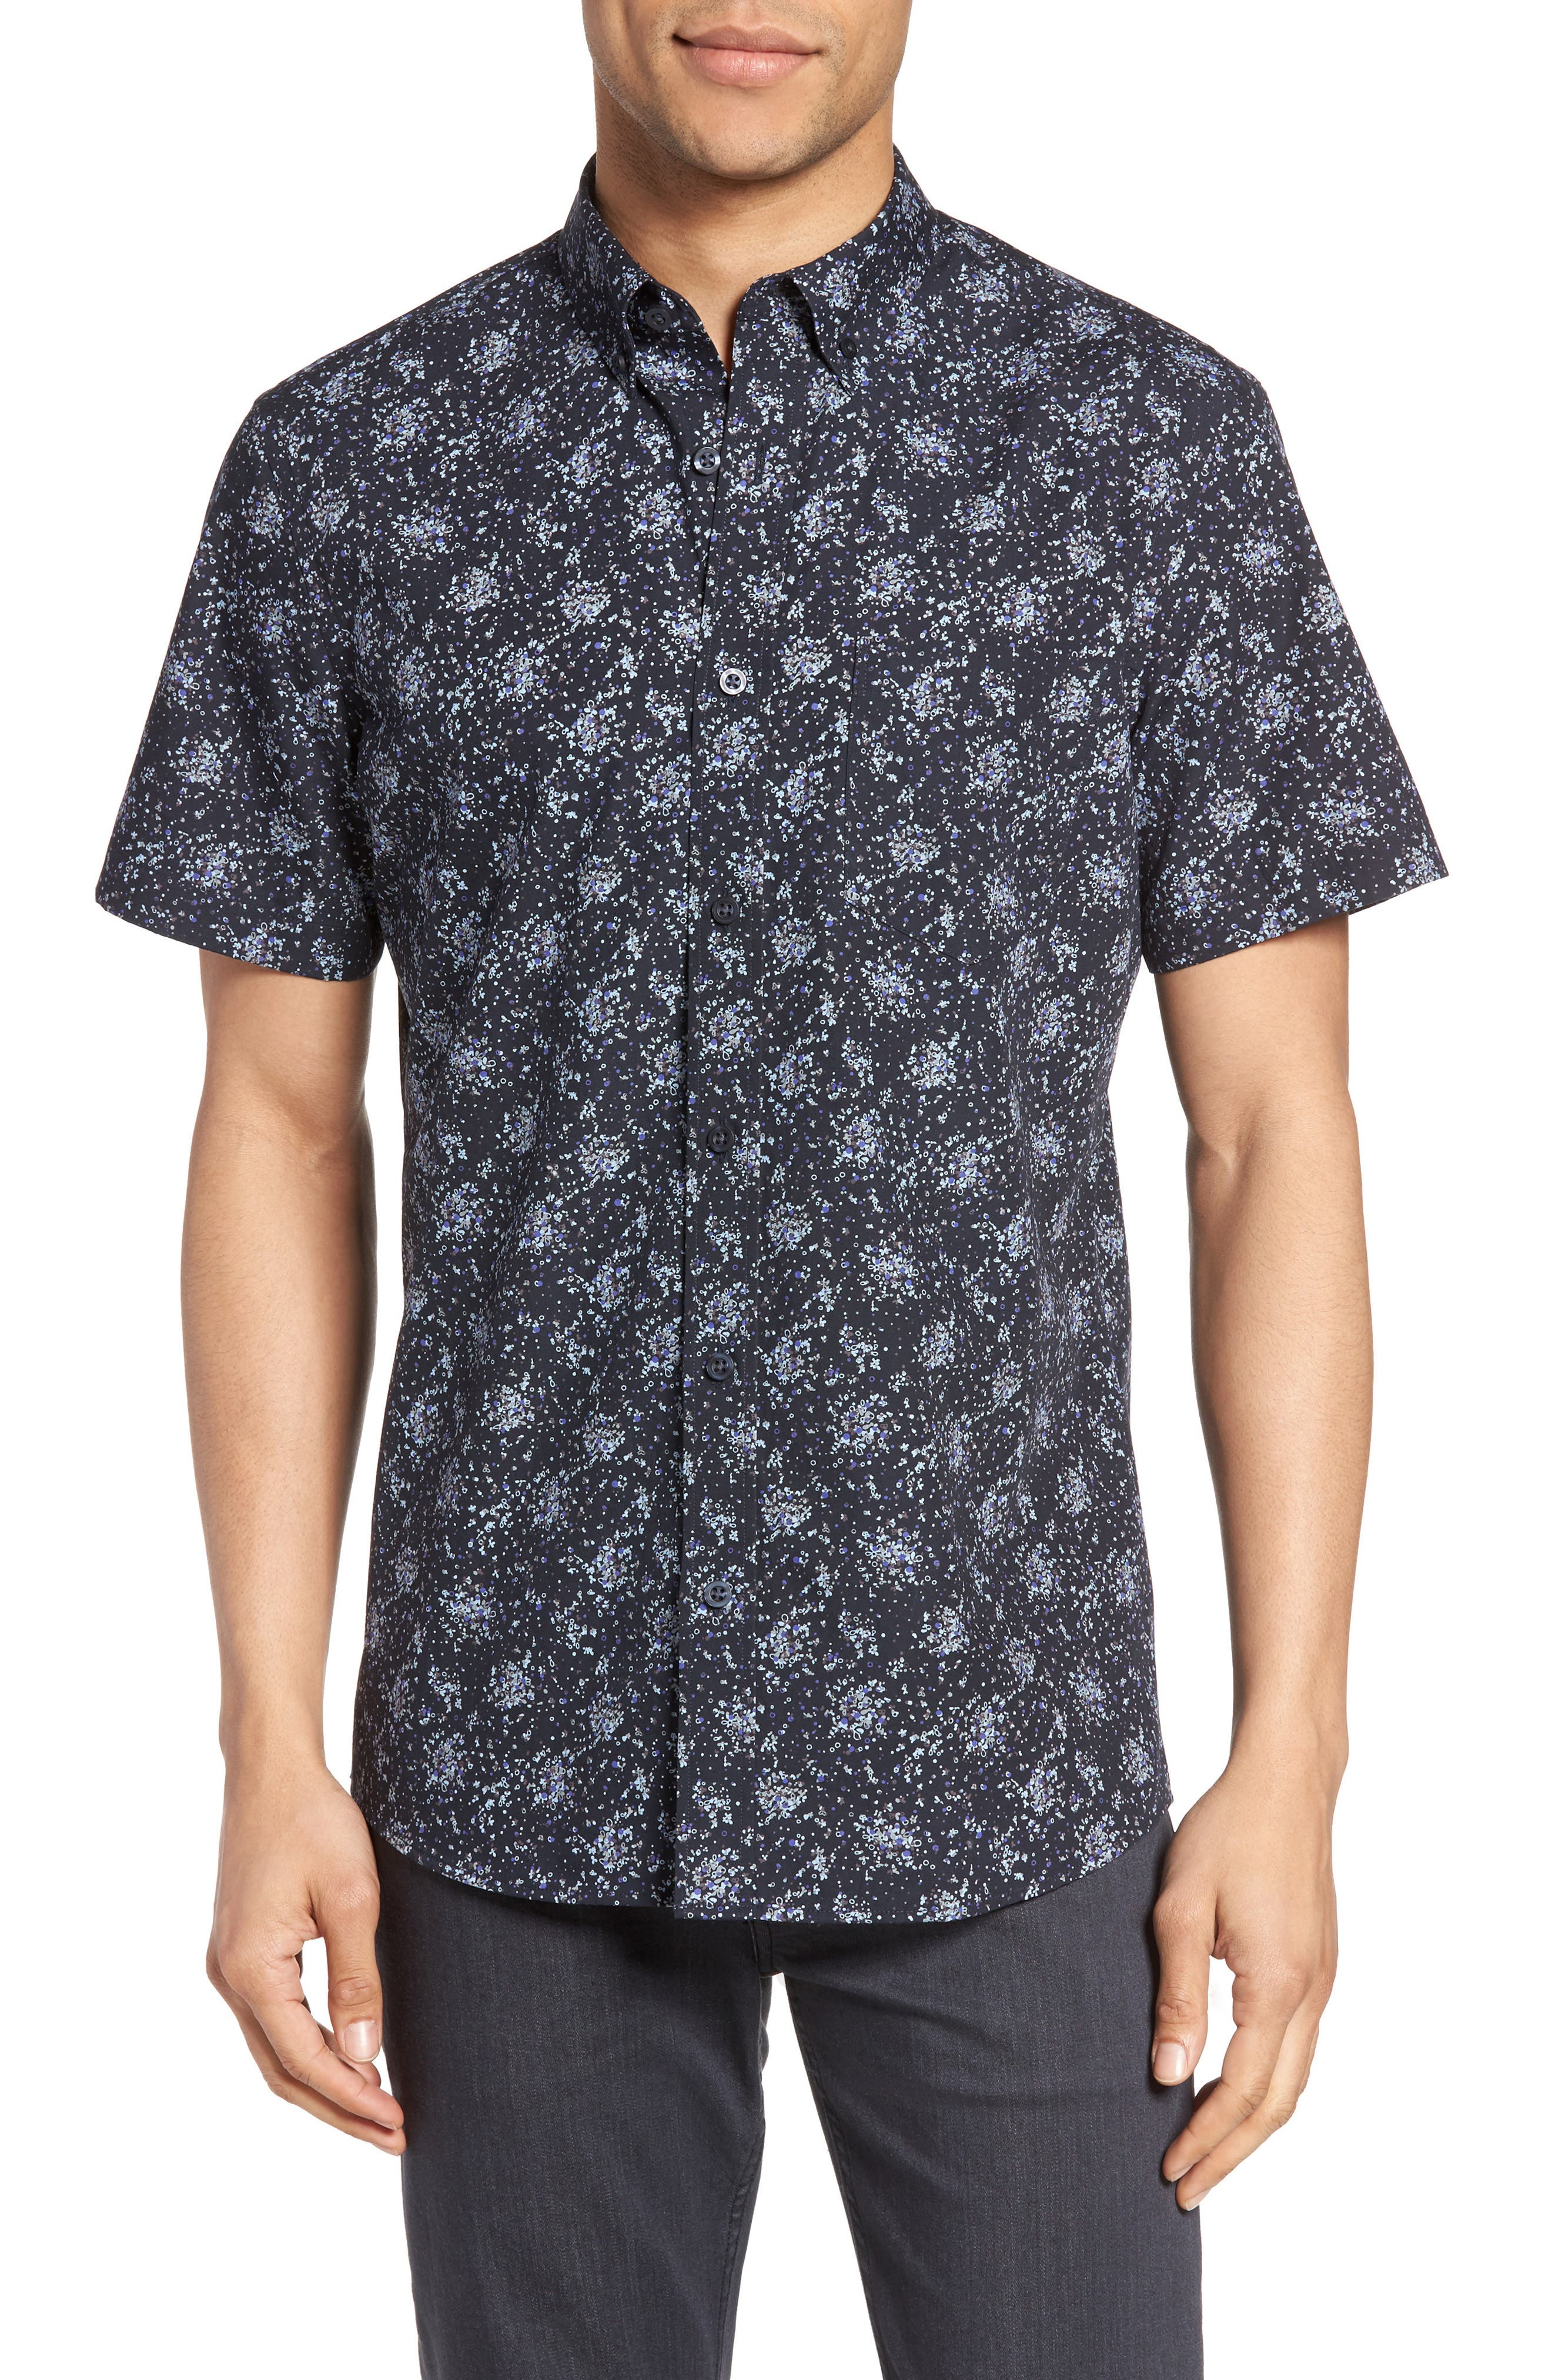 Nordstrom Men's Shop Slim Fit Print Sport Shirt